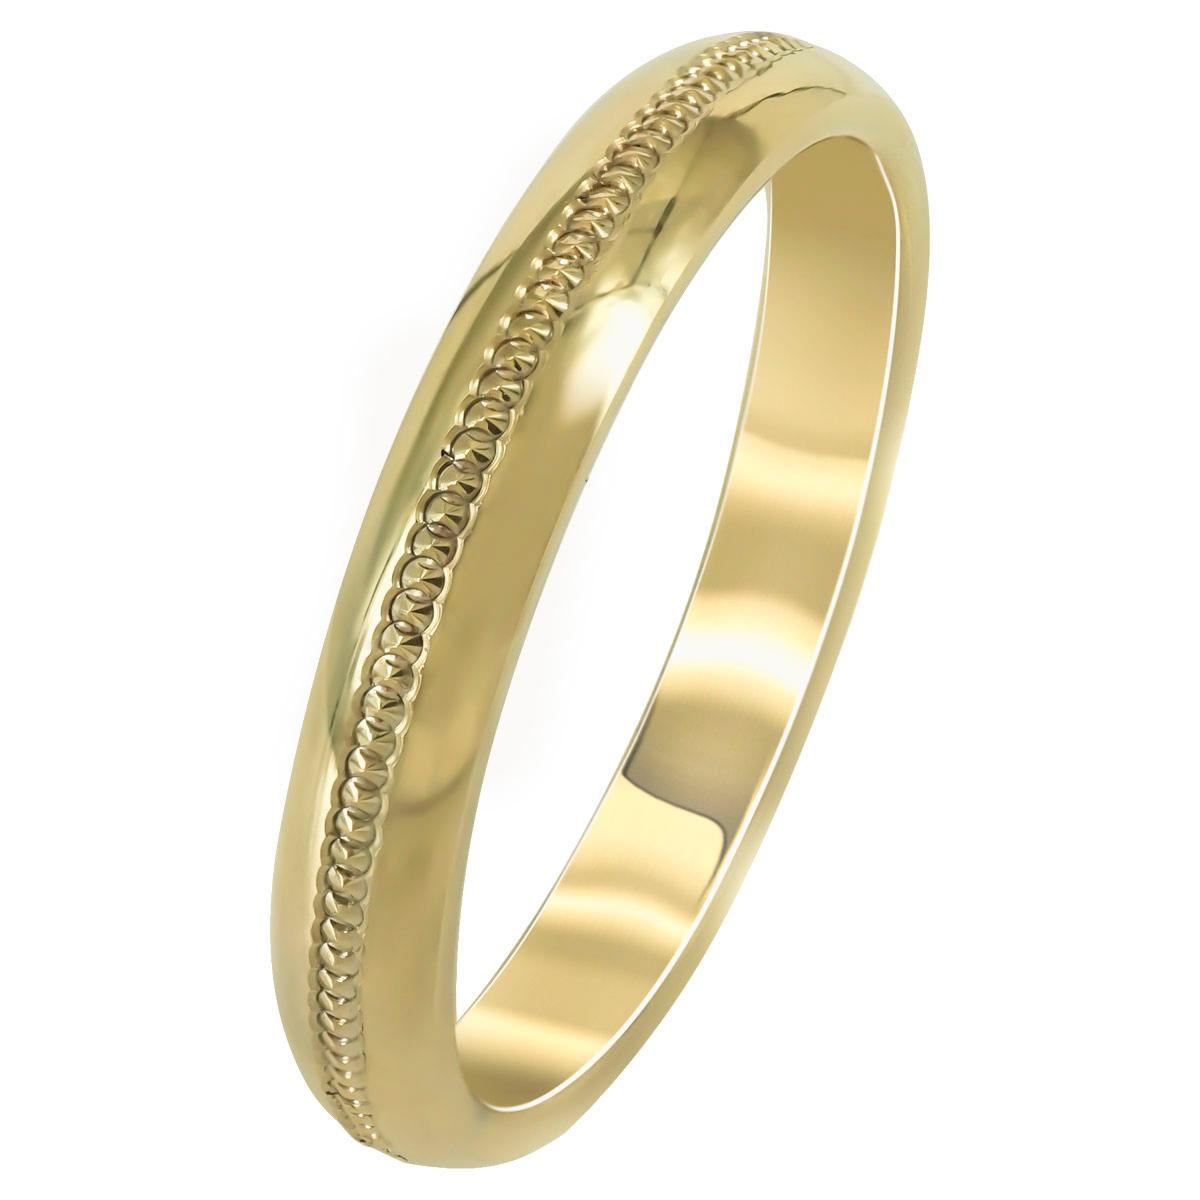 Kίτρινη Χρυσή Βέρα Γάμου WR253 k14